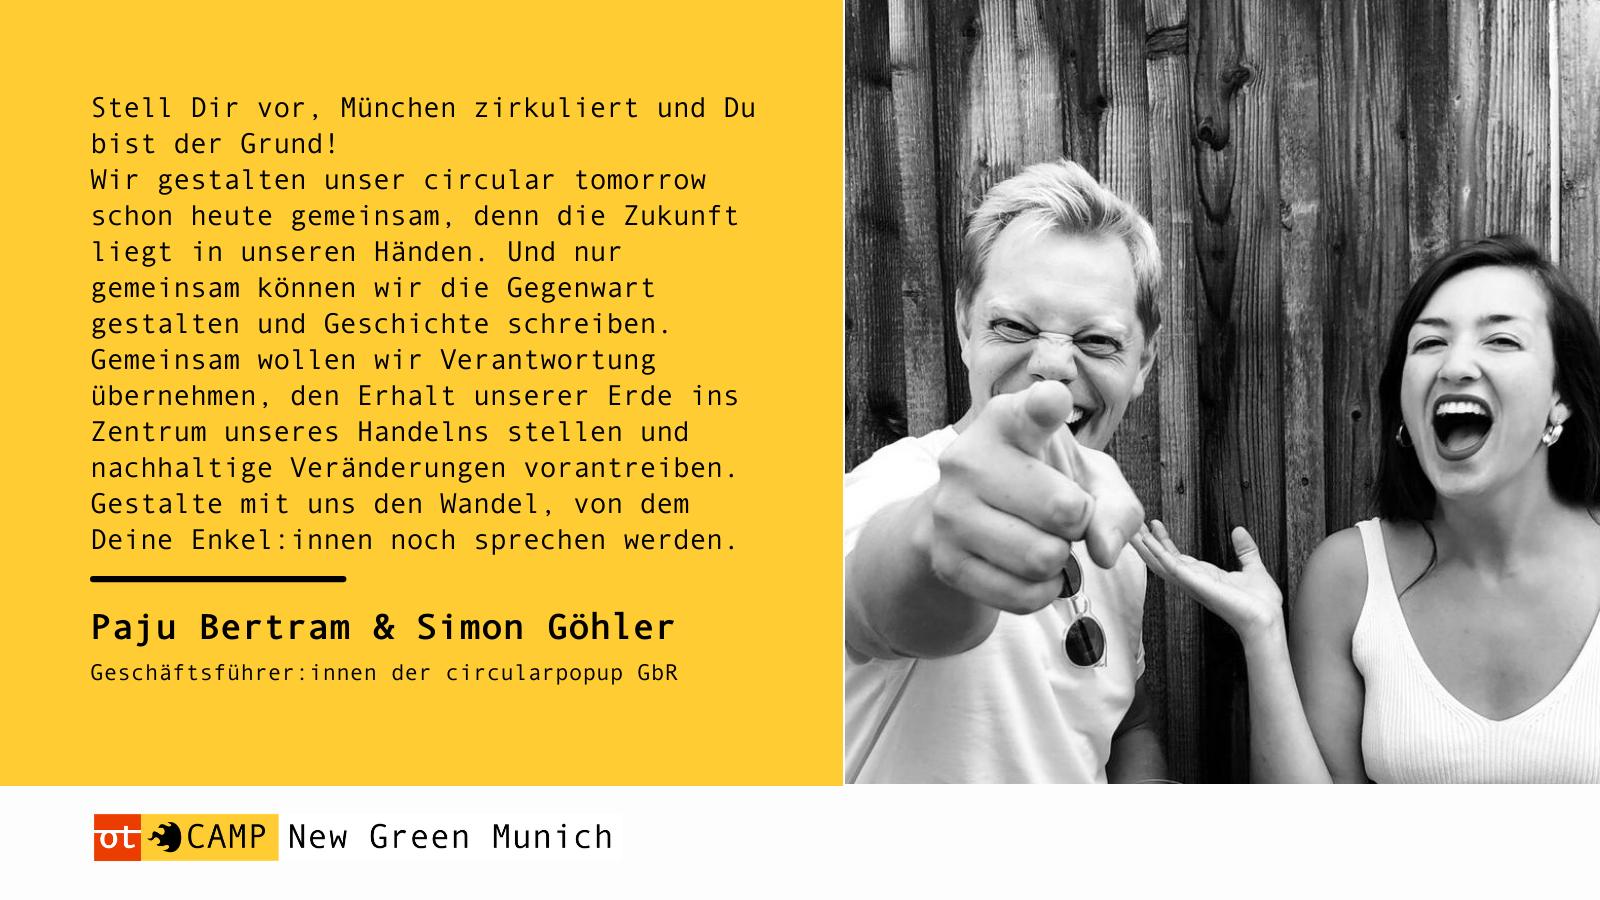 Testimonial von Paju Bertram & Simon Göhler